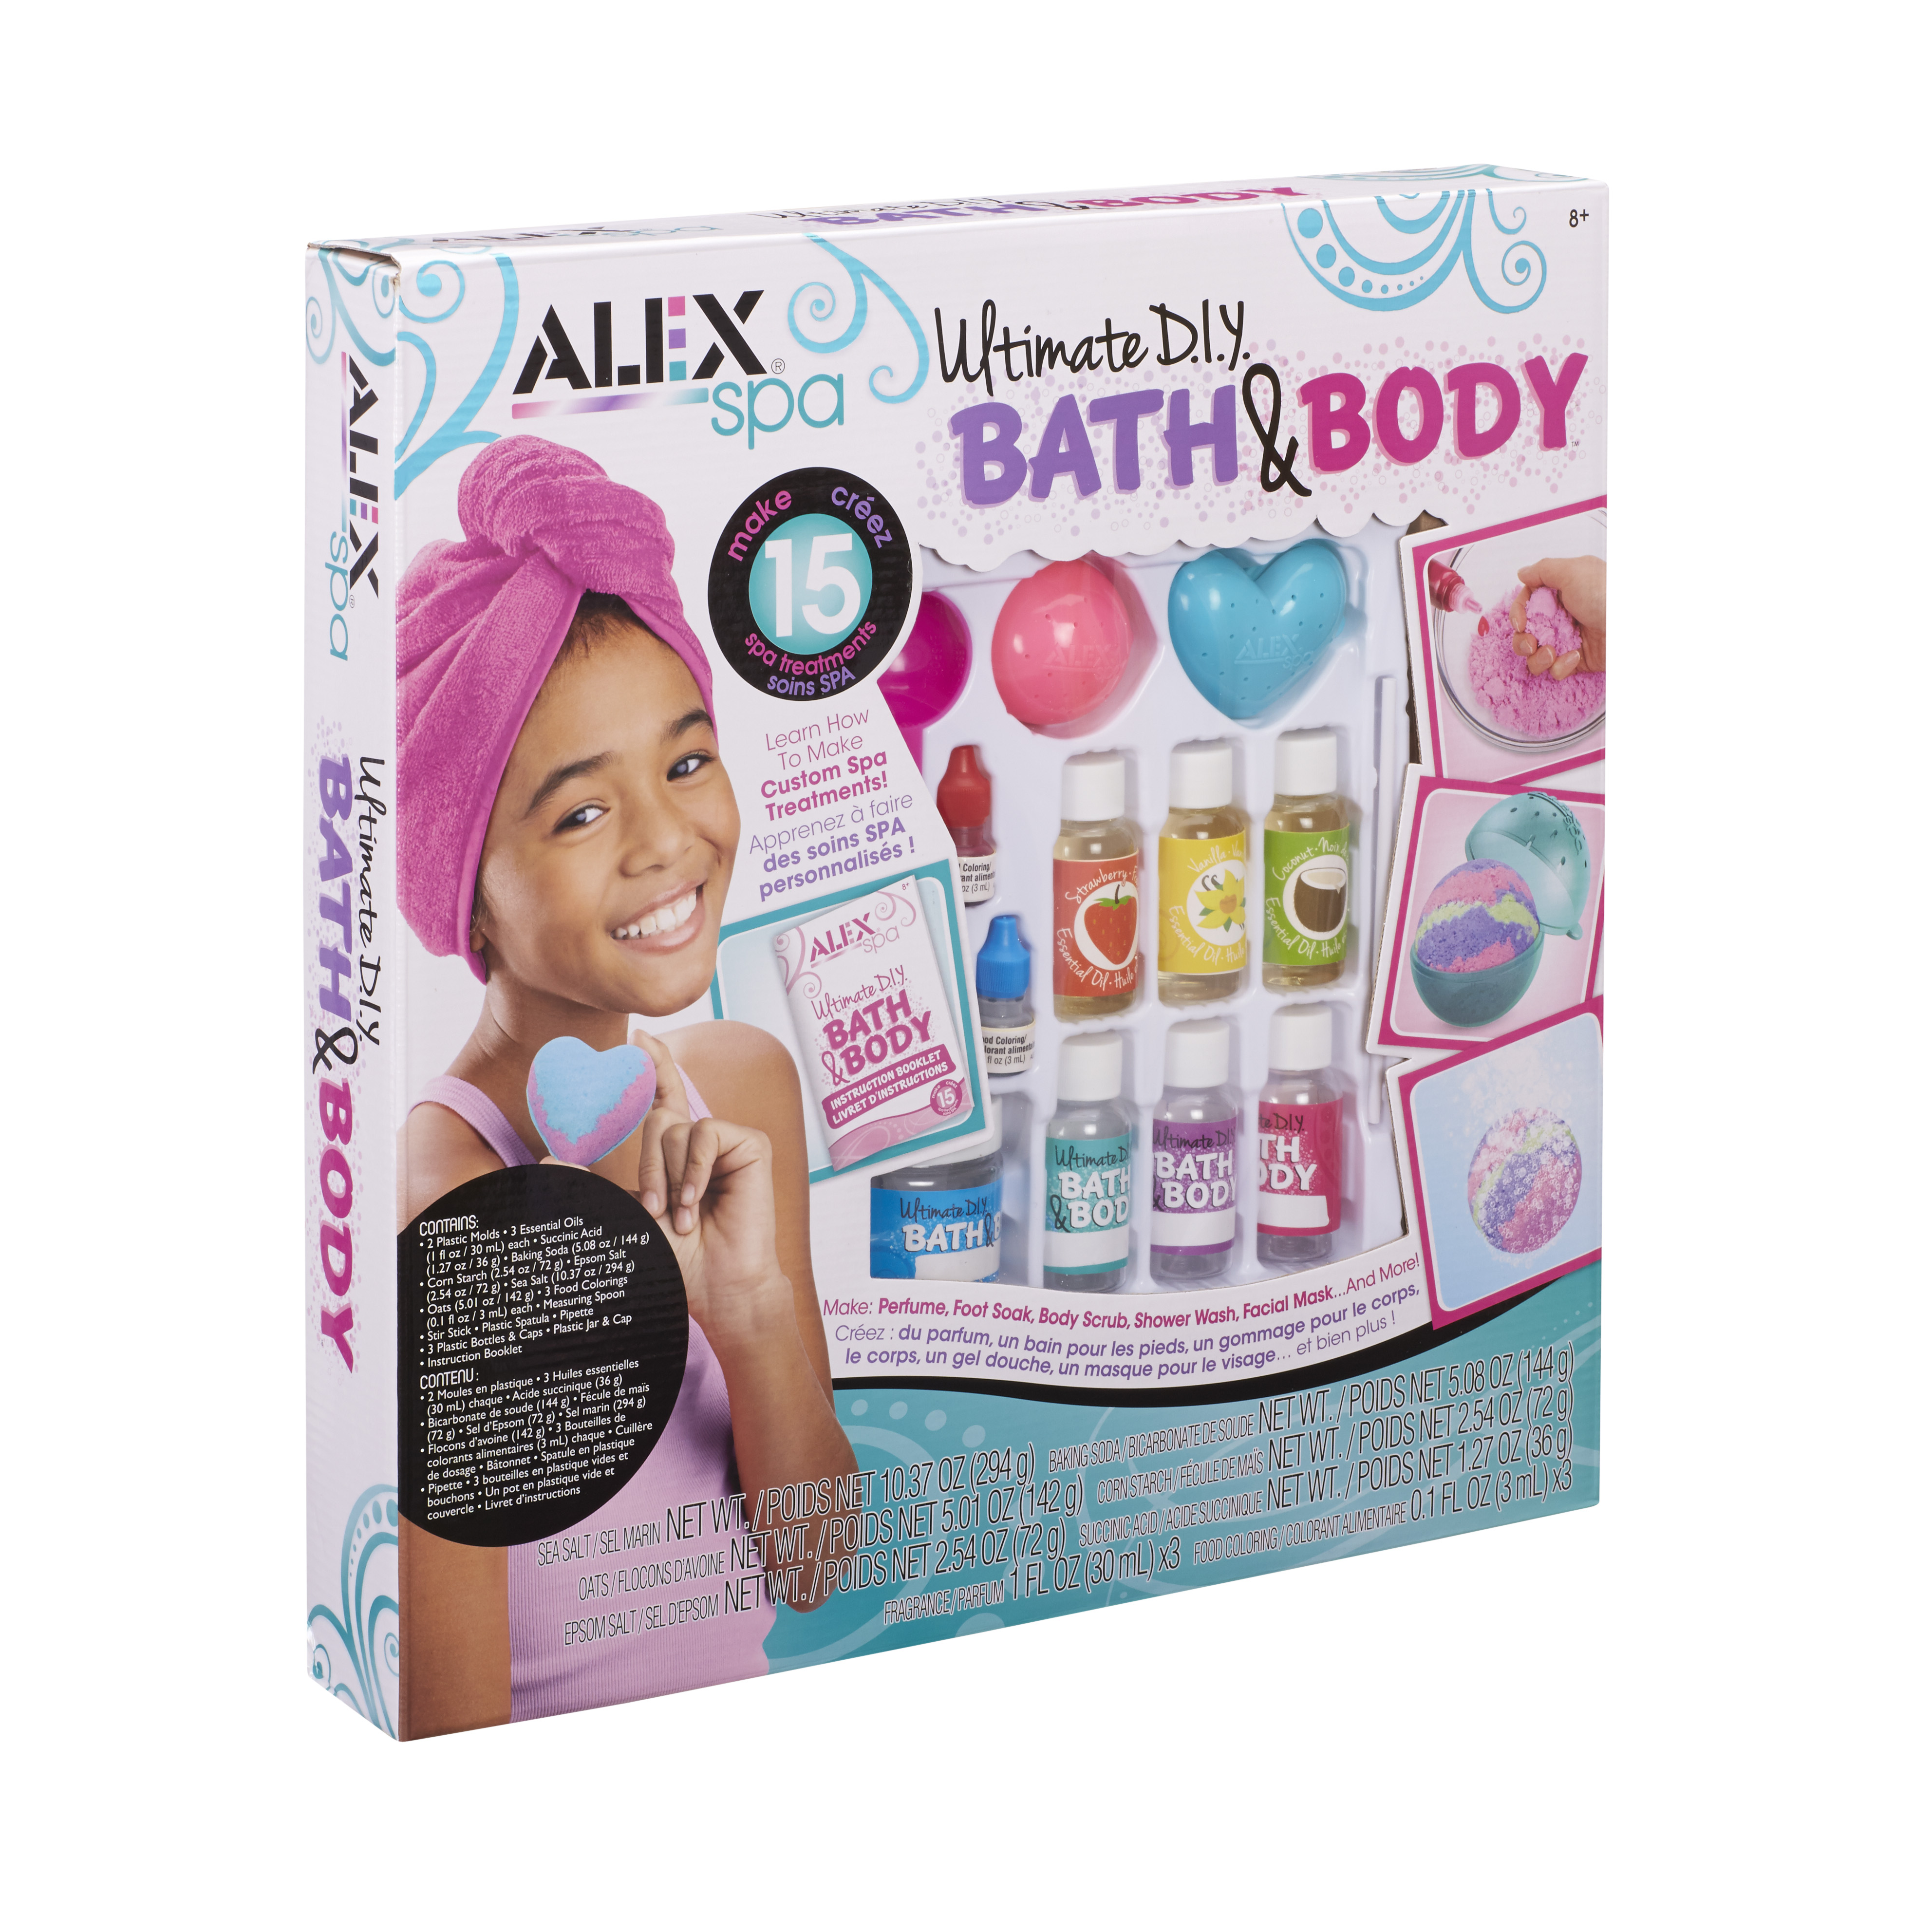 ALEX Spa Ultimate DIY Bath & Body Set: Make Bath Bombs, Perfume, and Much More!